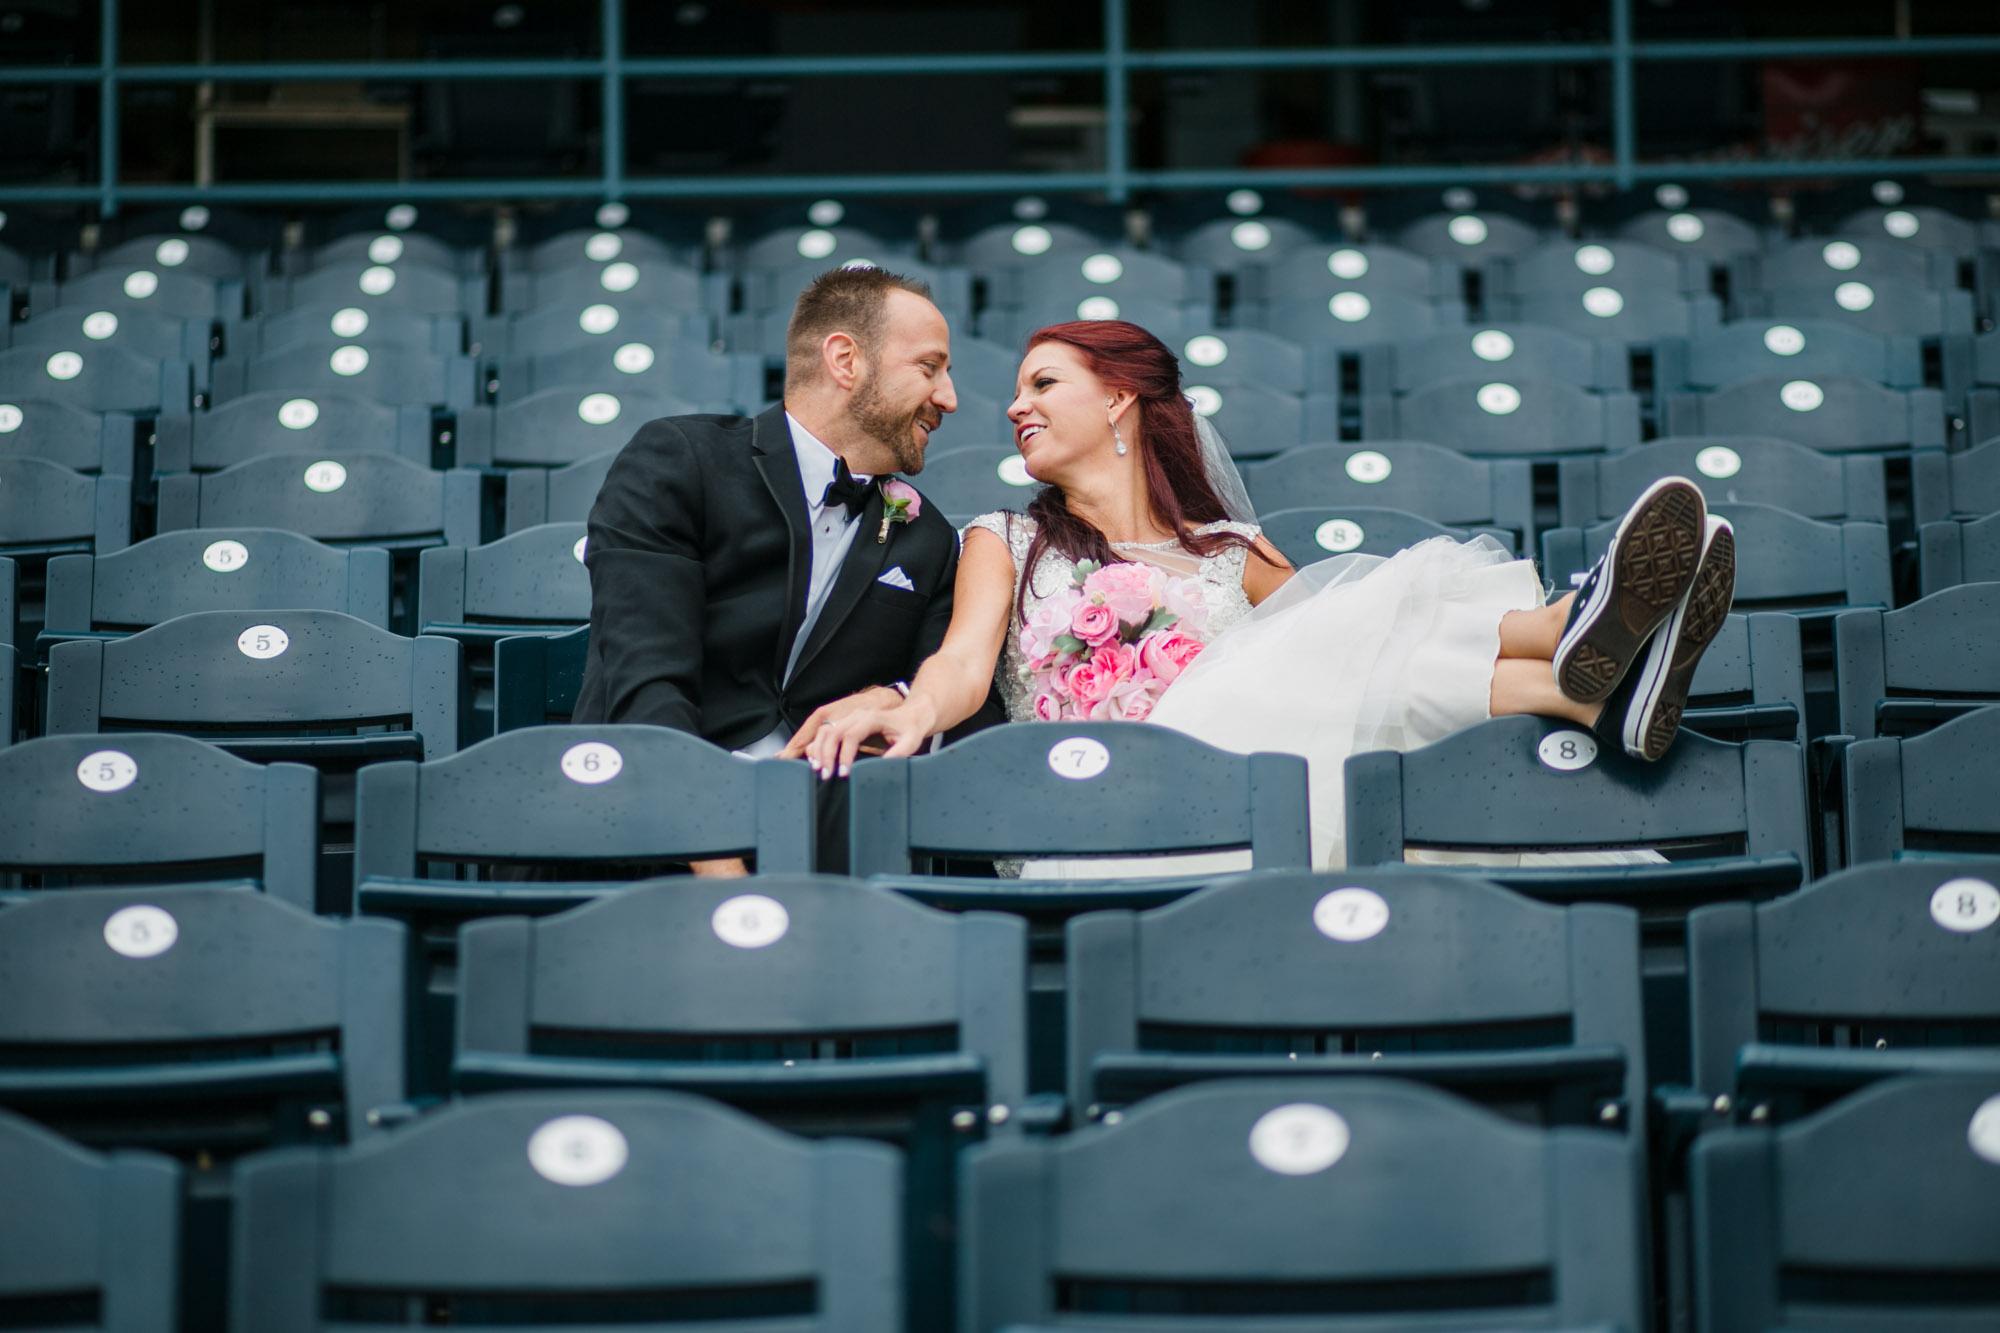 hensville-wedding-downtown-toledo-ohio (84 of 103).jpg